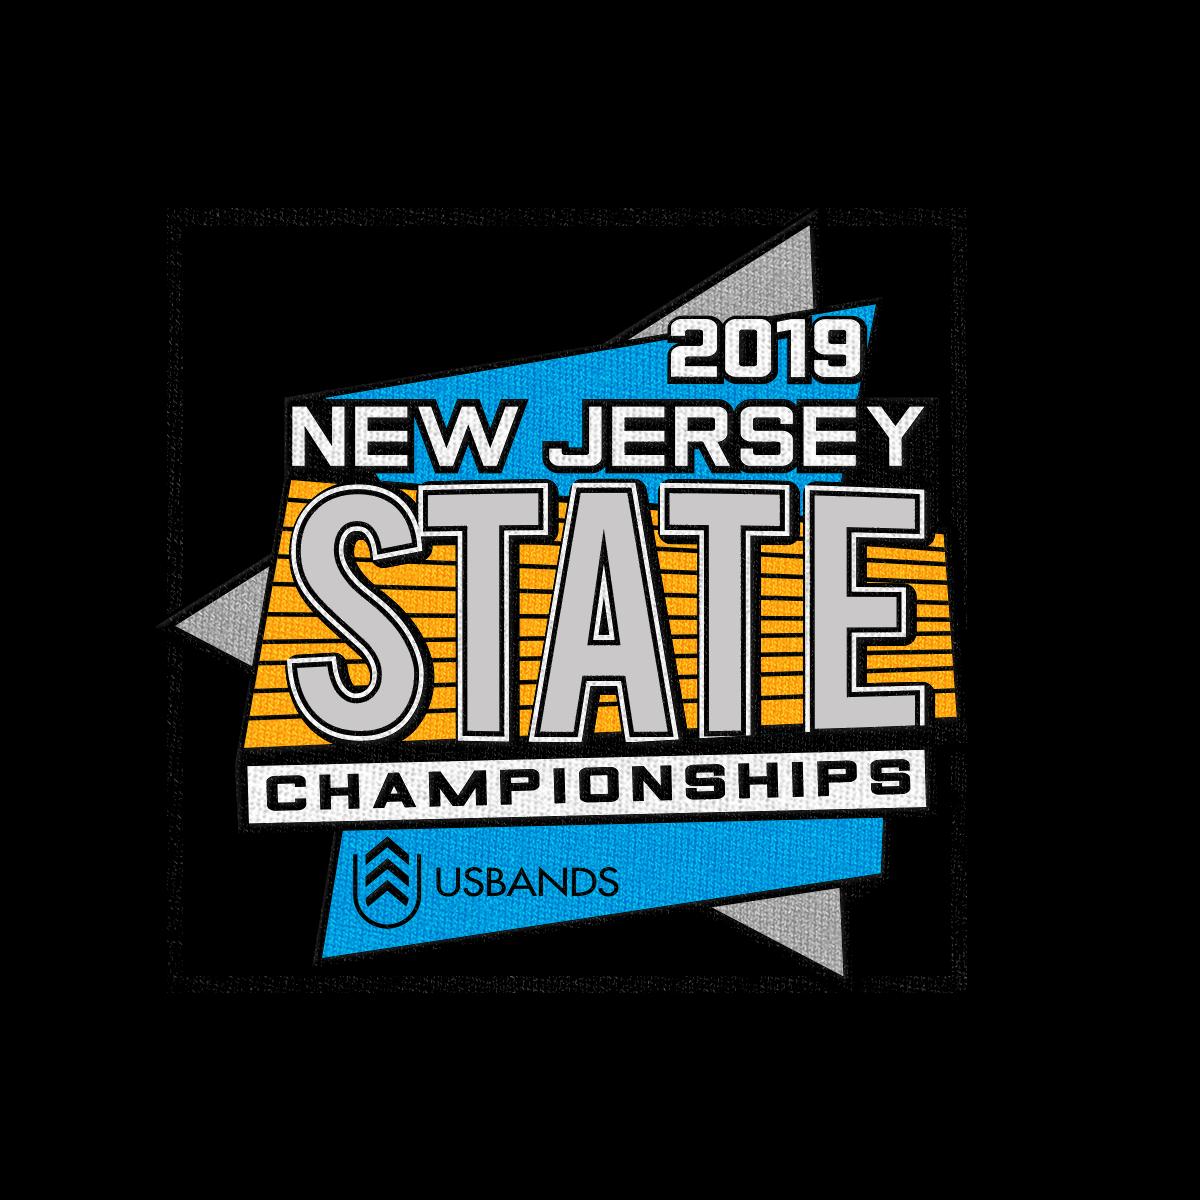 2019 USBands New Jersey State Championships Patch